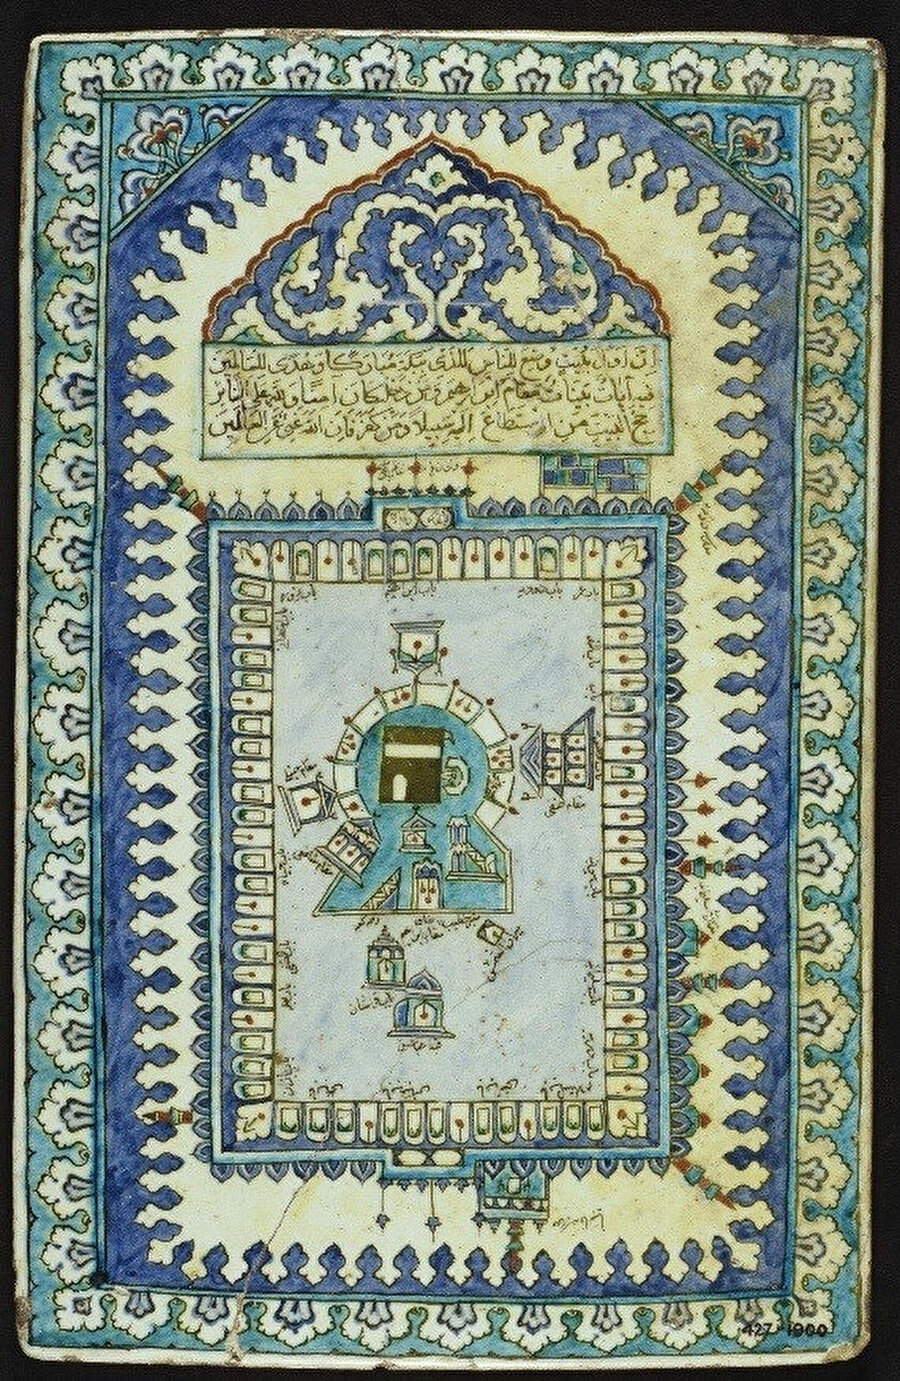 Kâbe tasvirli çini pano, Osmanlı, İznik, 1650, Victoria and Albert Museum, 427-1900